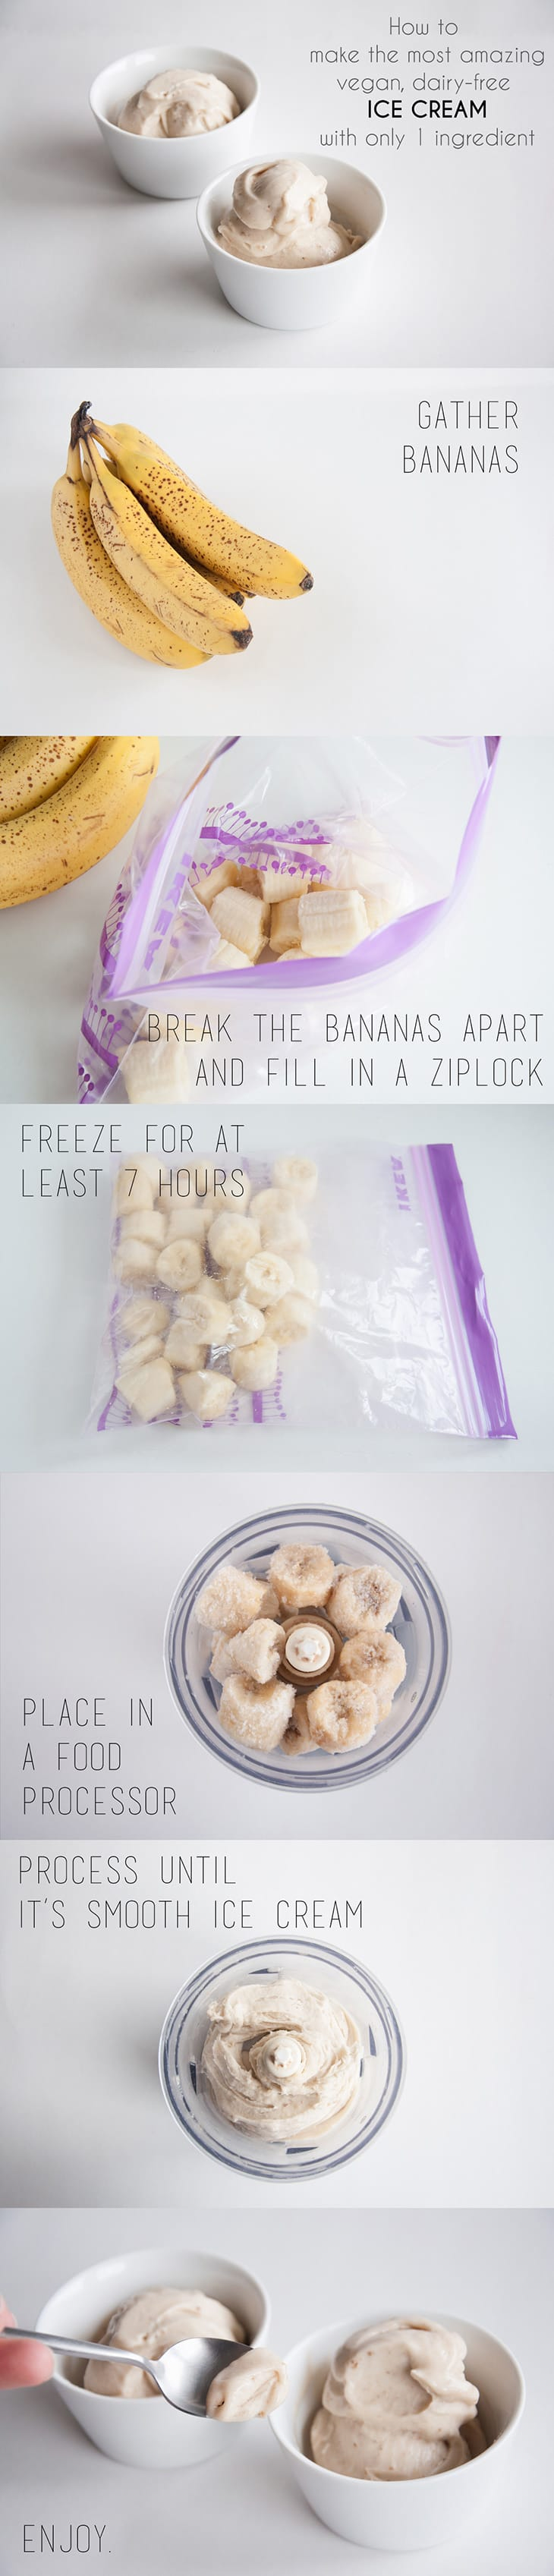 1 Ingredient Ice Cream (vegan, gluten-free, dairy-free, refined sugar-free) |ElephantasticVegan.com